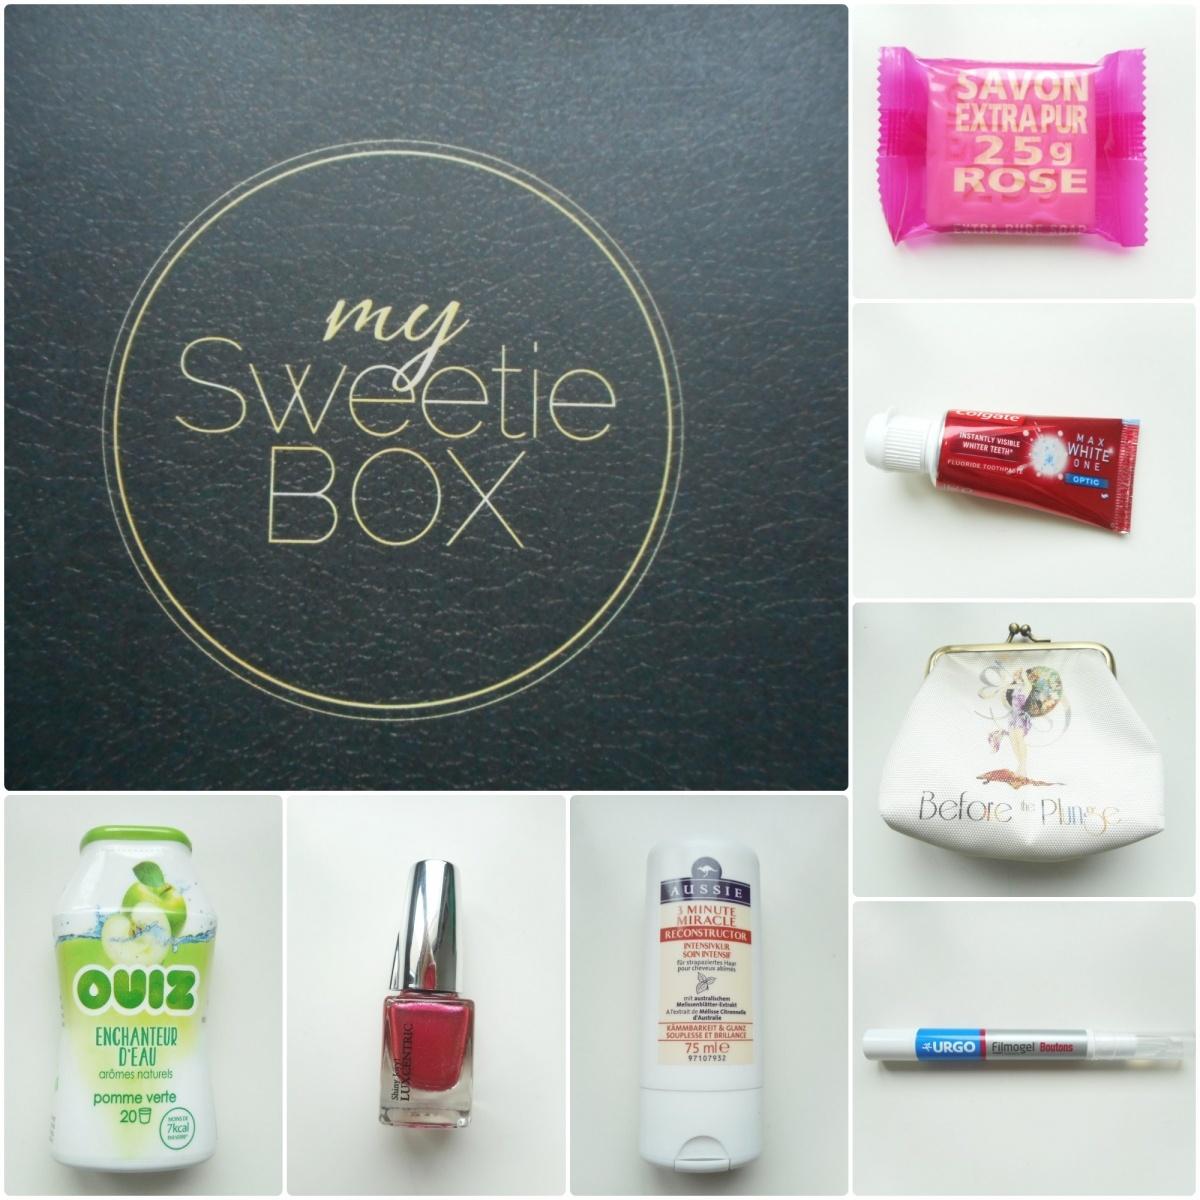 mysweetiebox-my-sweetie-box-vanity-affaire-mars-2015-contenu-avis